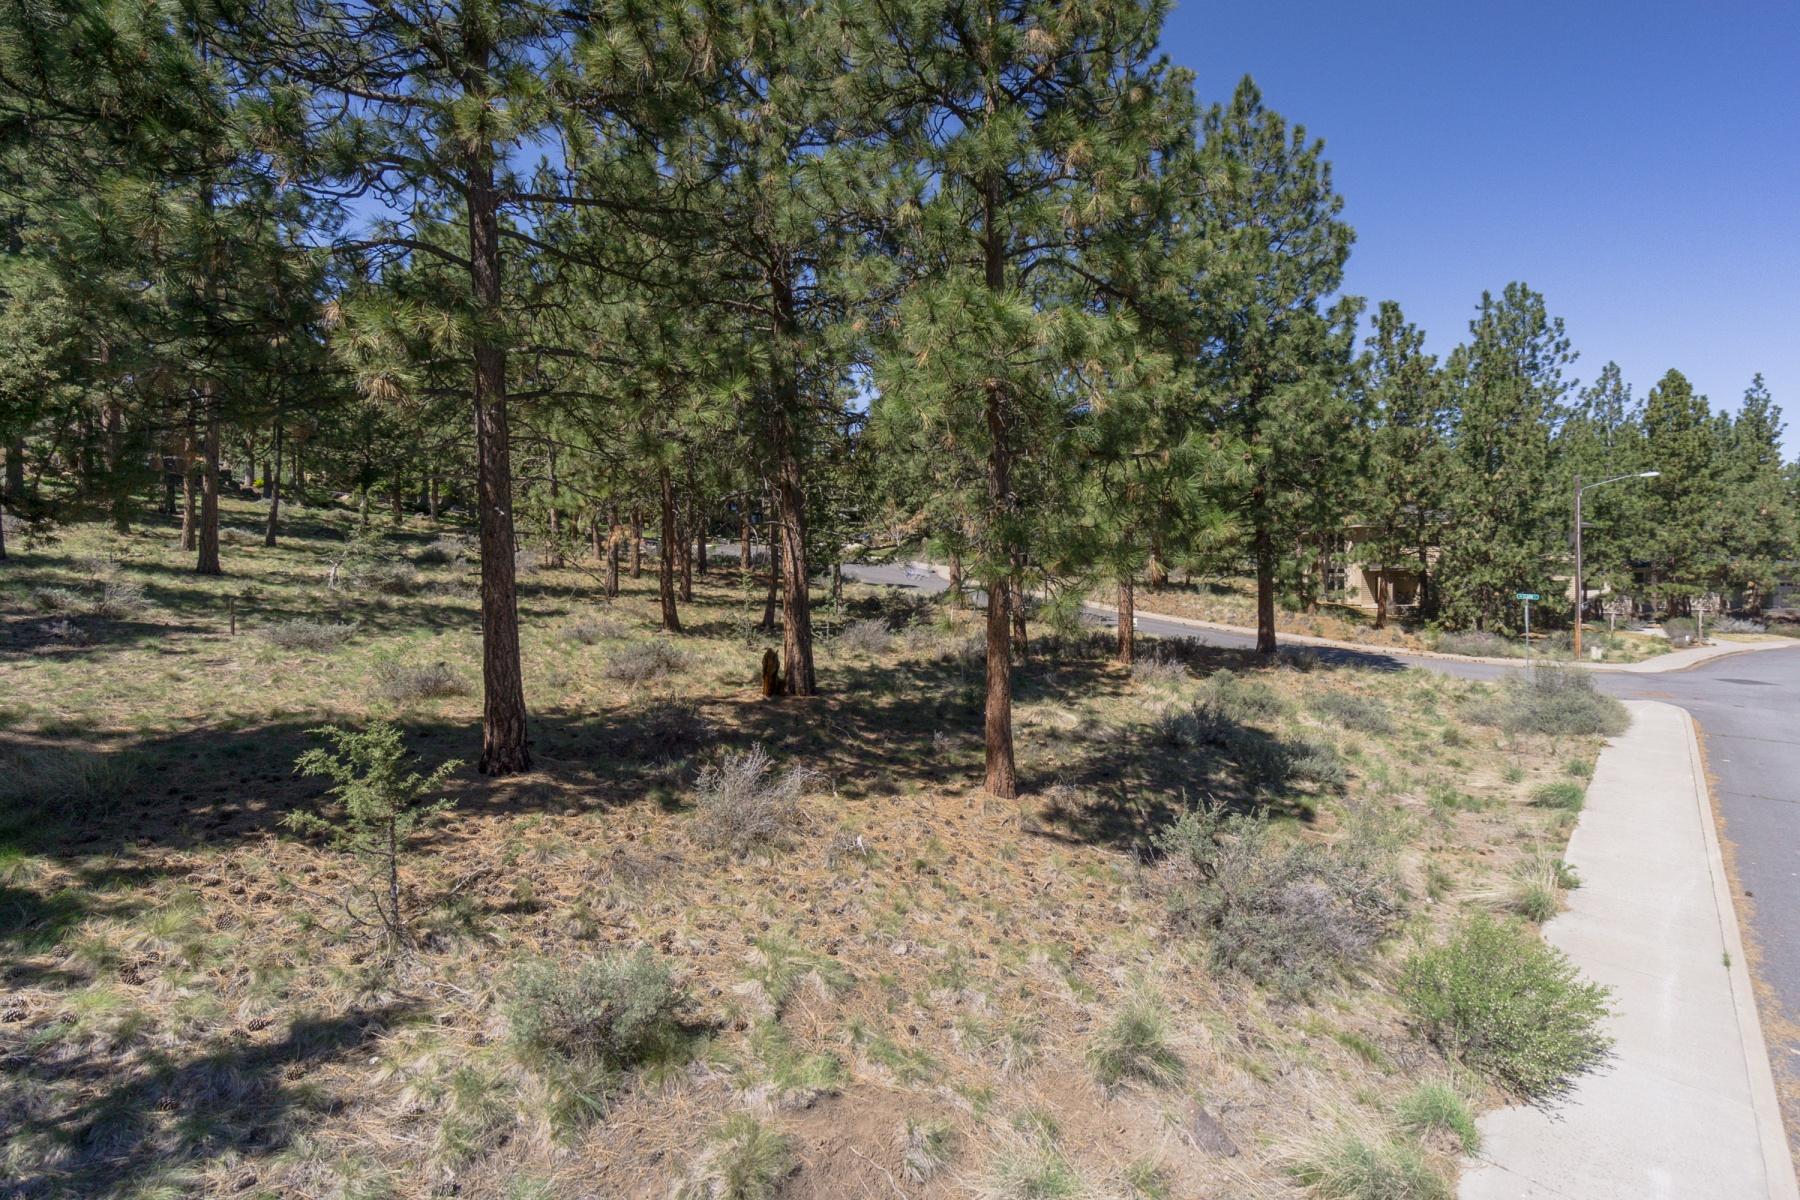 Terreno para Venda às Fantastic Awbrey Butte Home Site 1119 NW Clark Ct Bend, Oregon, 97701 Estados Unidos